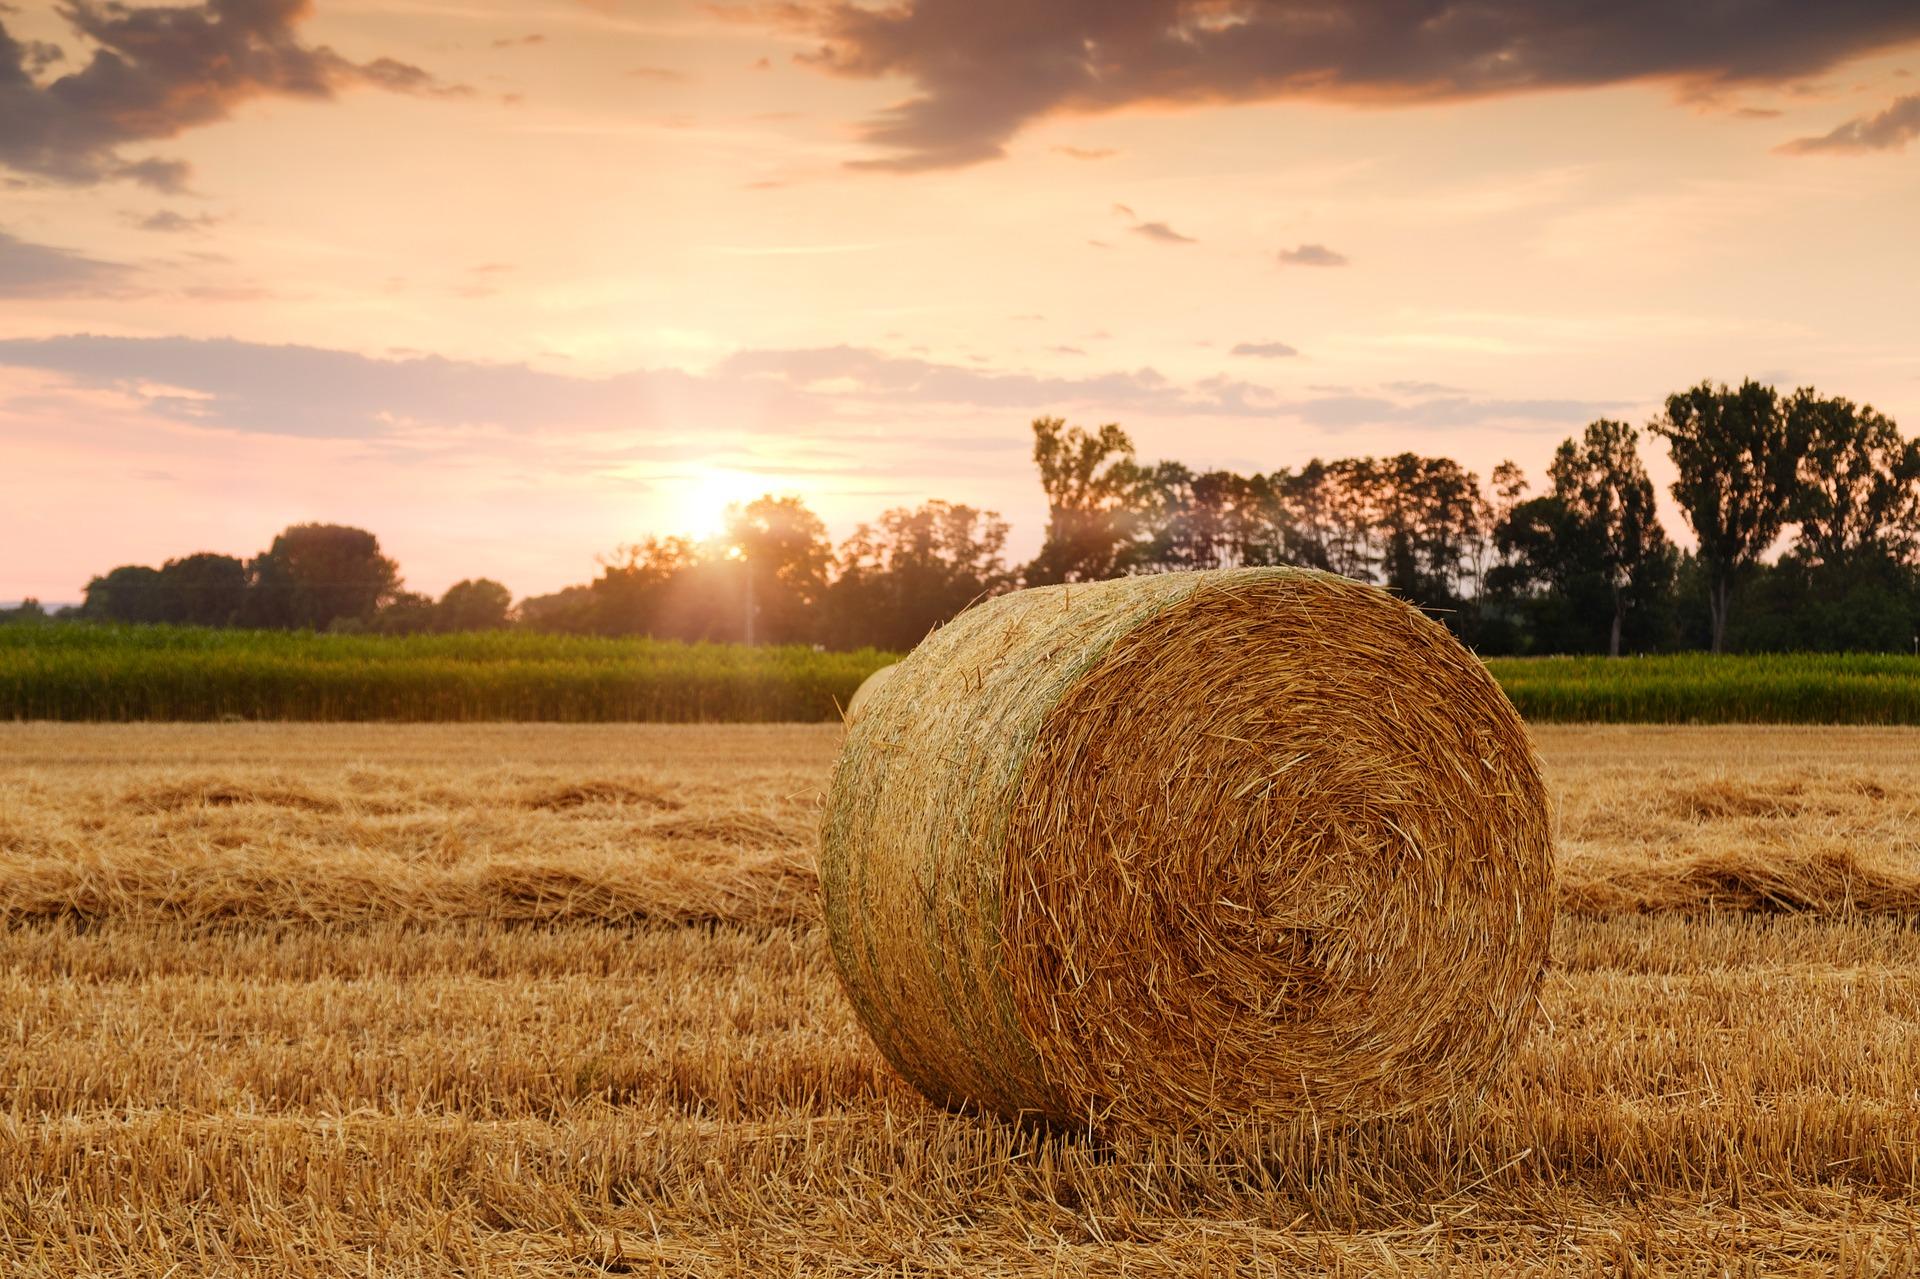 straw-bales-3521063_1920.jpg